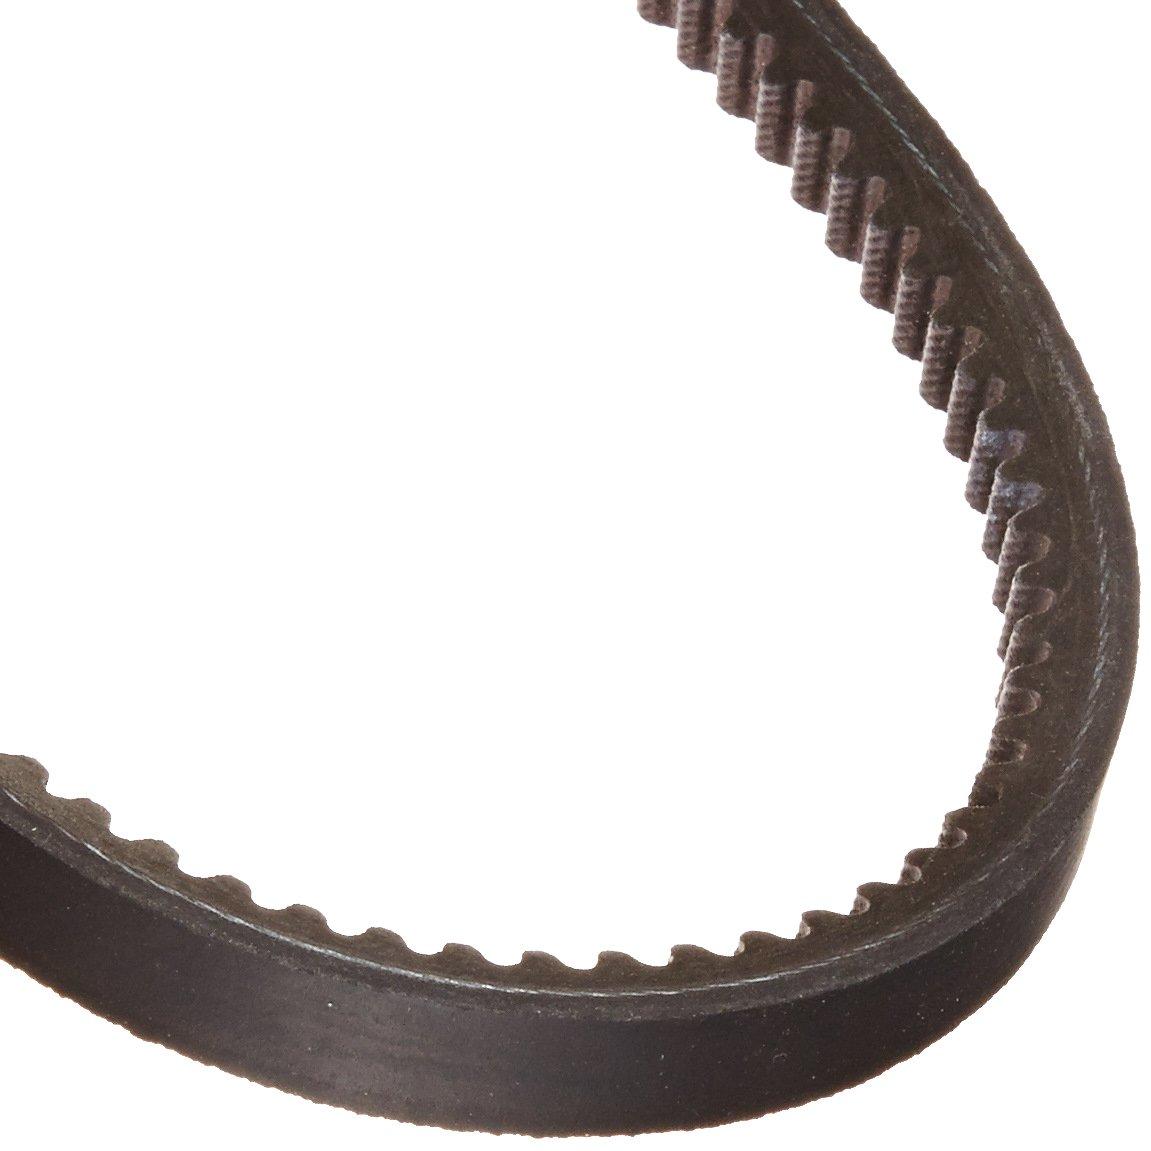 D/&D PowerDrive 1040-8M-25 Timing Belt